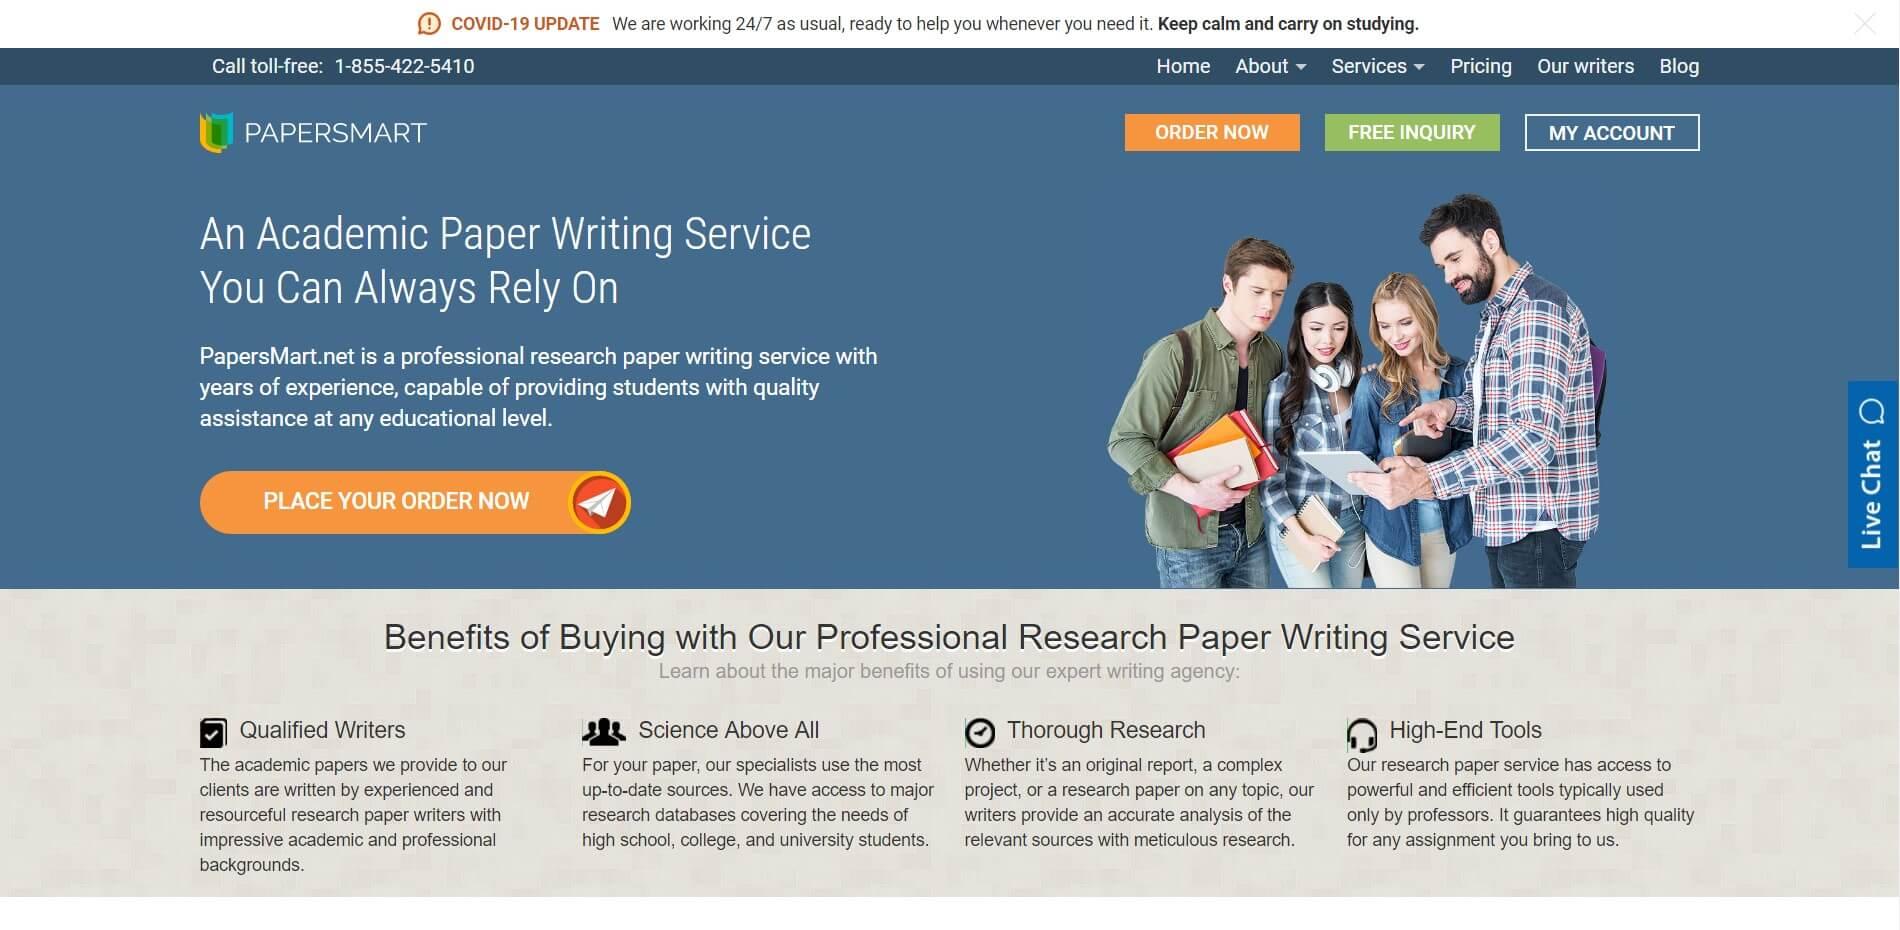 papersmart.net review